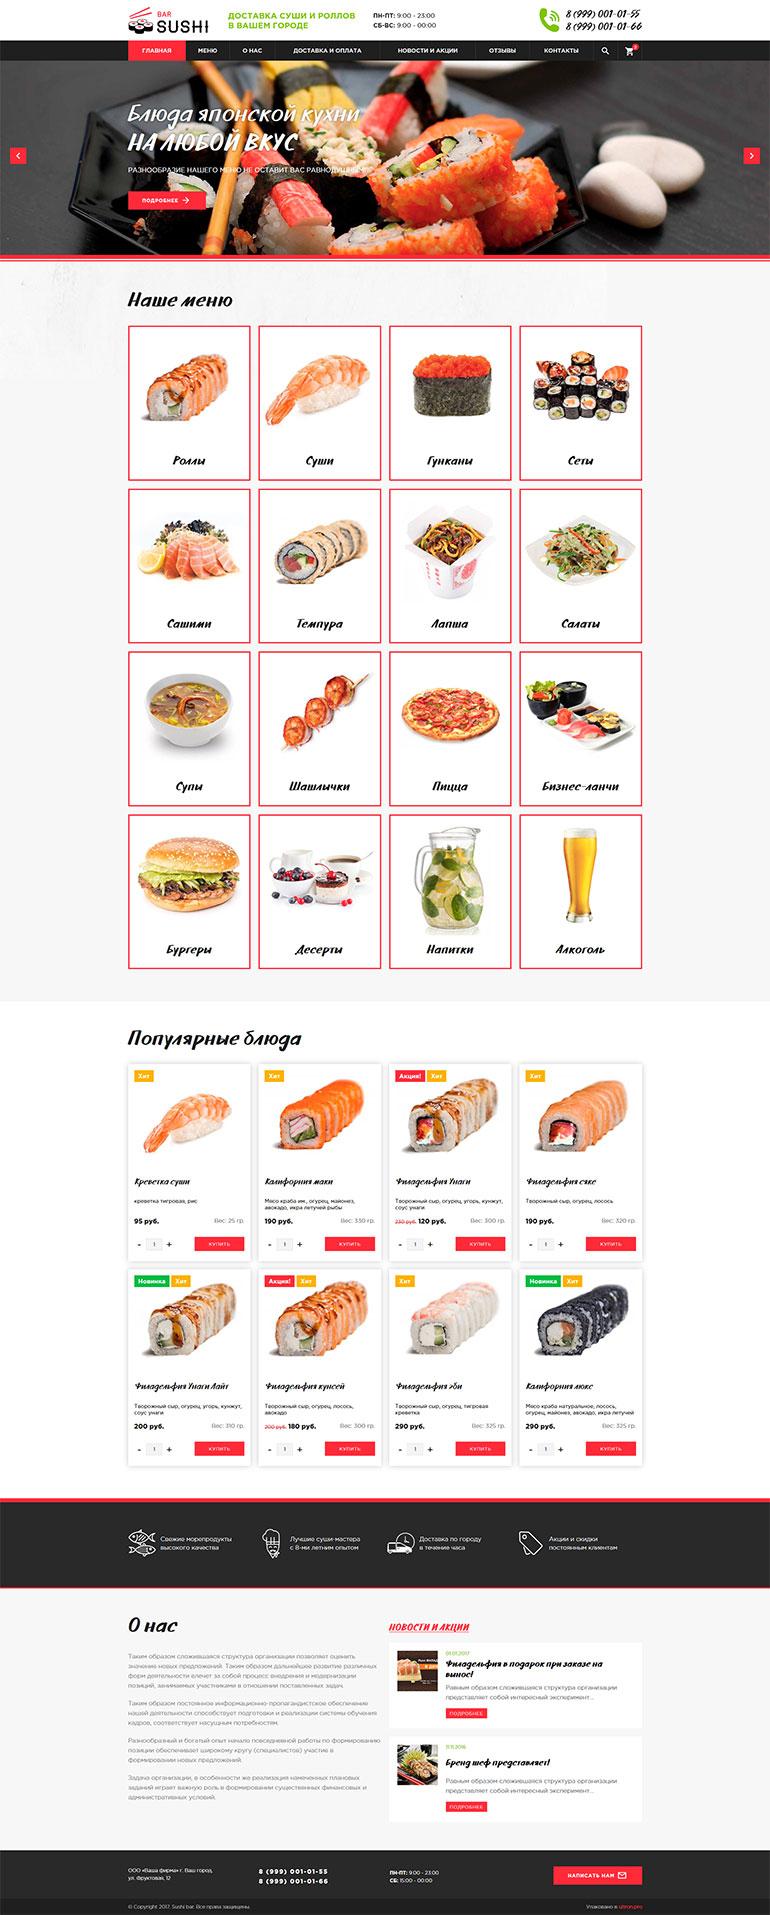 sushi-bar1.jpg